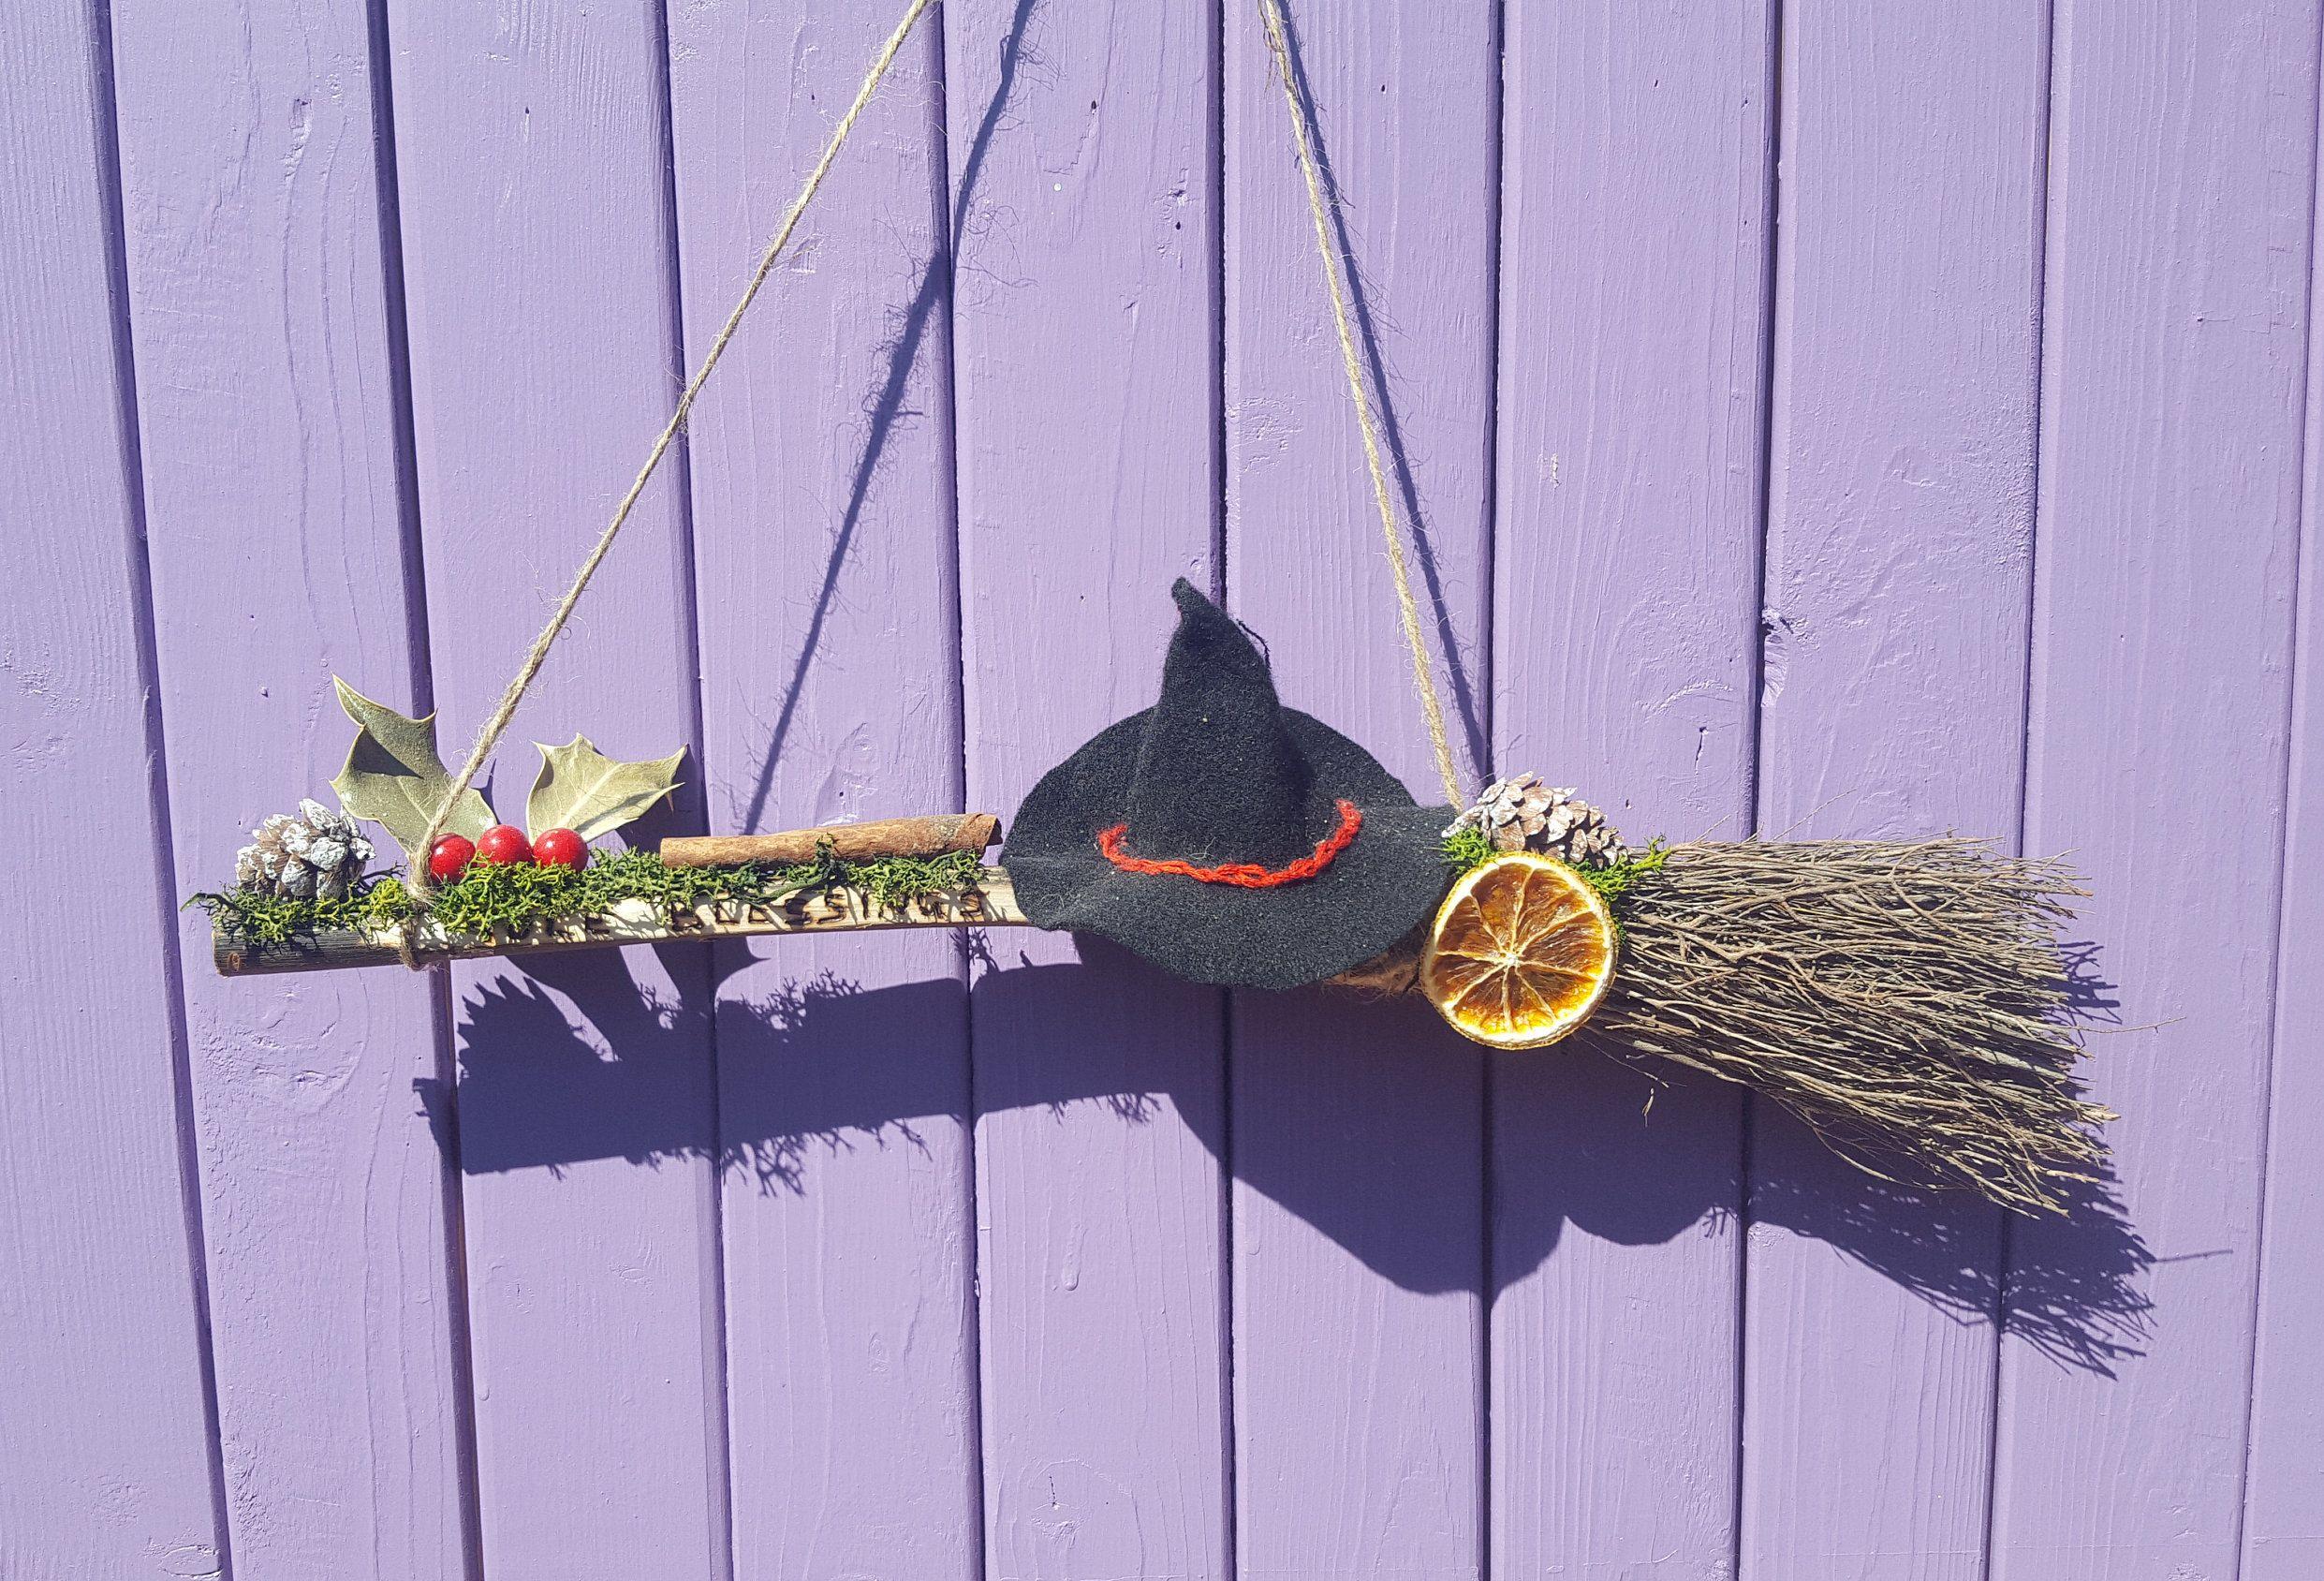 Xmas Wall Hanging Dried Oranges Heart Yule Wreath Festive Door Hanger Miniature Broomstick Wiccan Besom Broom Yuletide Decoration